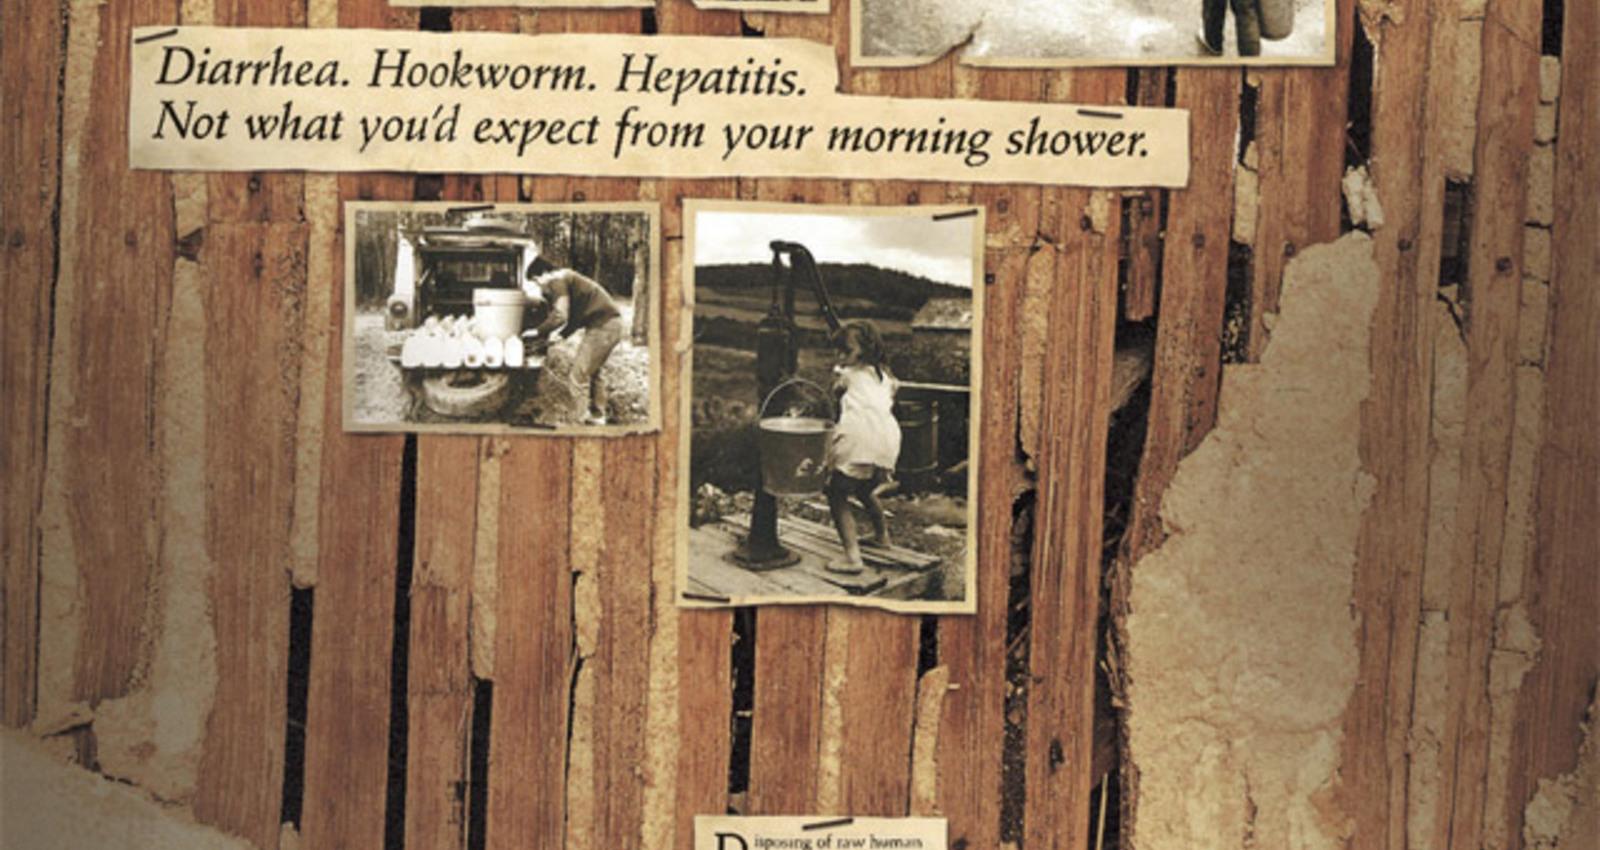 Bathroomquote;Drinking Waterquote;Shower